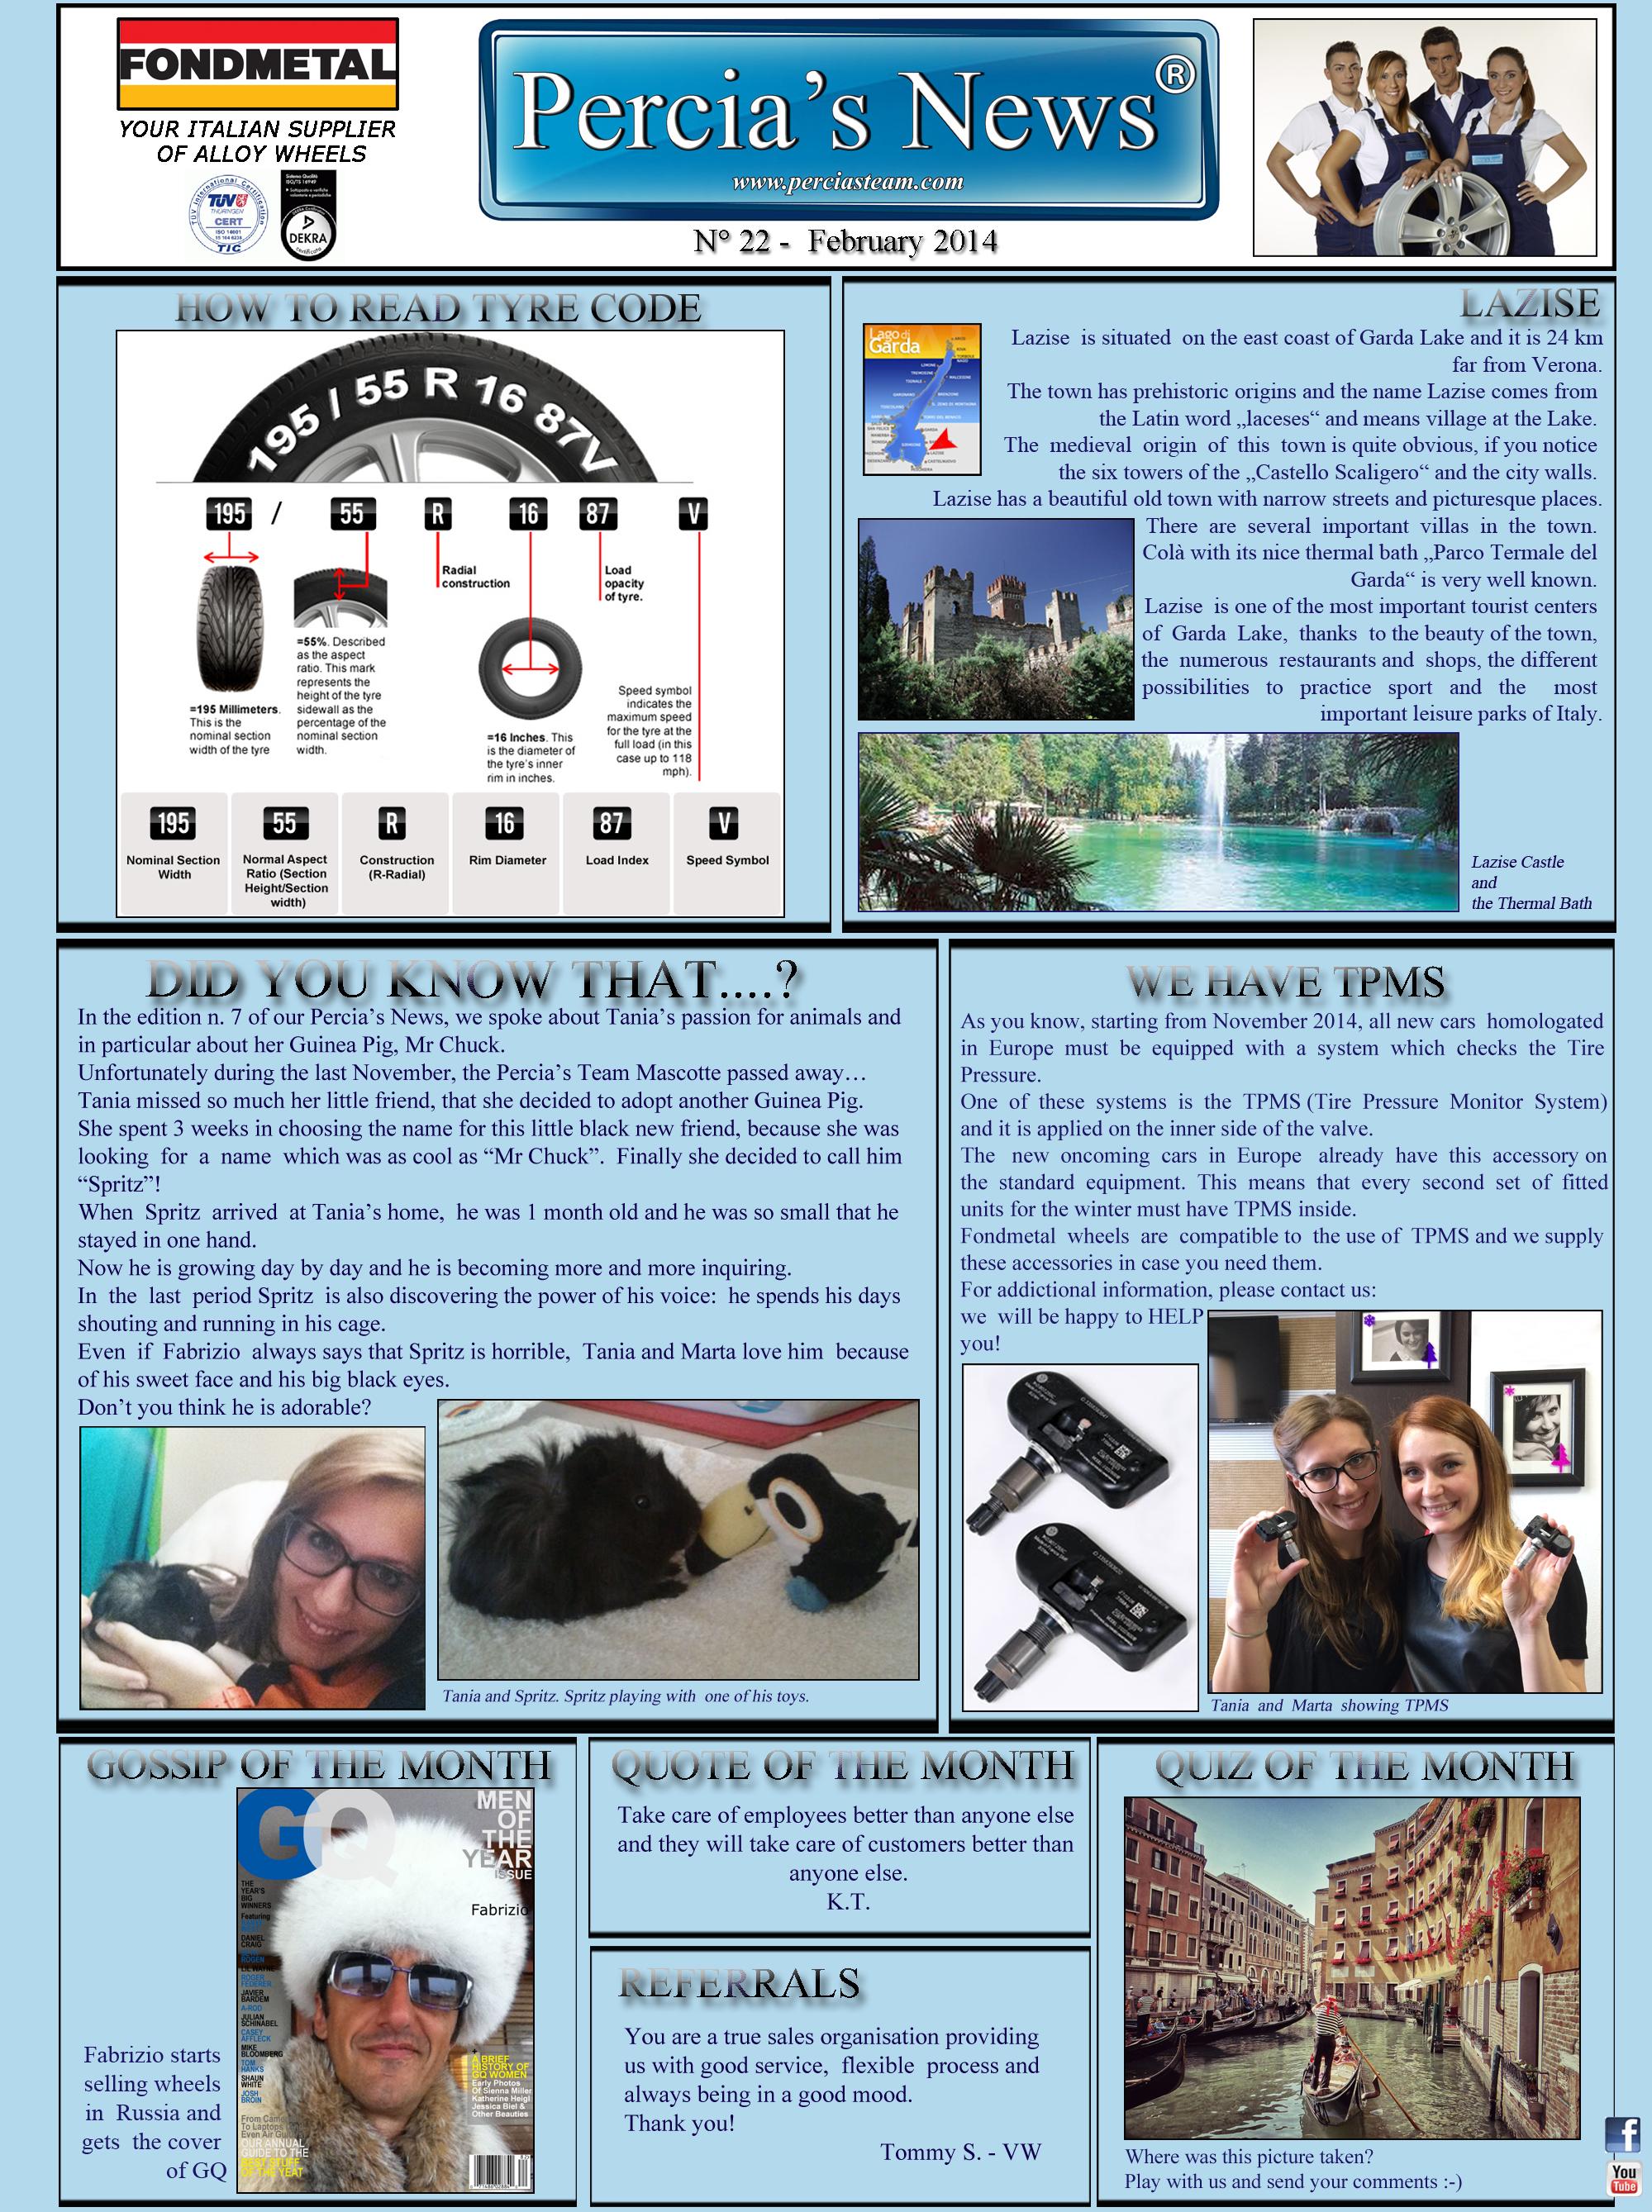 PERCIA'S NEWS FEBRUARY 2014